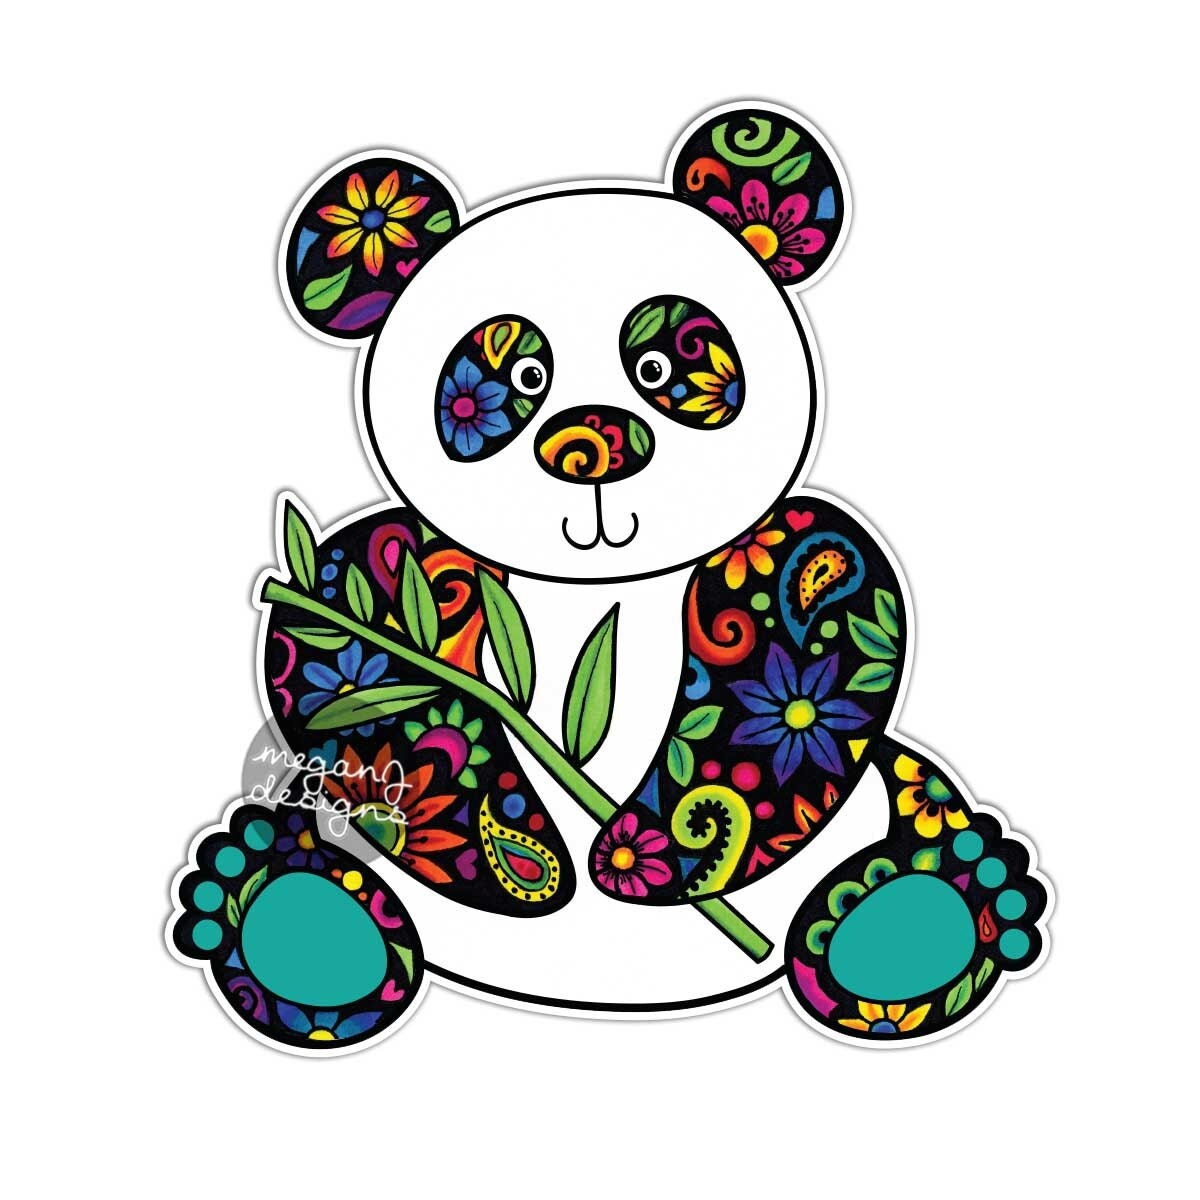 Cute car sticker designs - Panda Car Decal Colorful Flowers Design Bumper Sticker Laptop Decal Pink Green Teal Yellow Jungle Cute Car Decal Hippie Boho Panda Bear